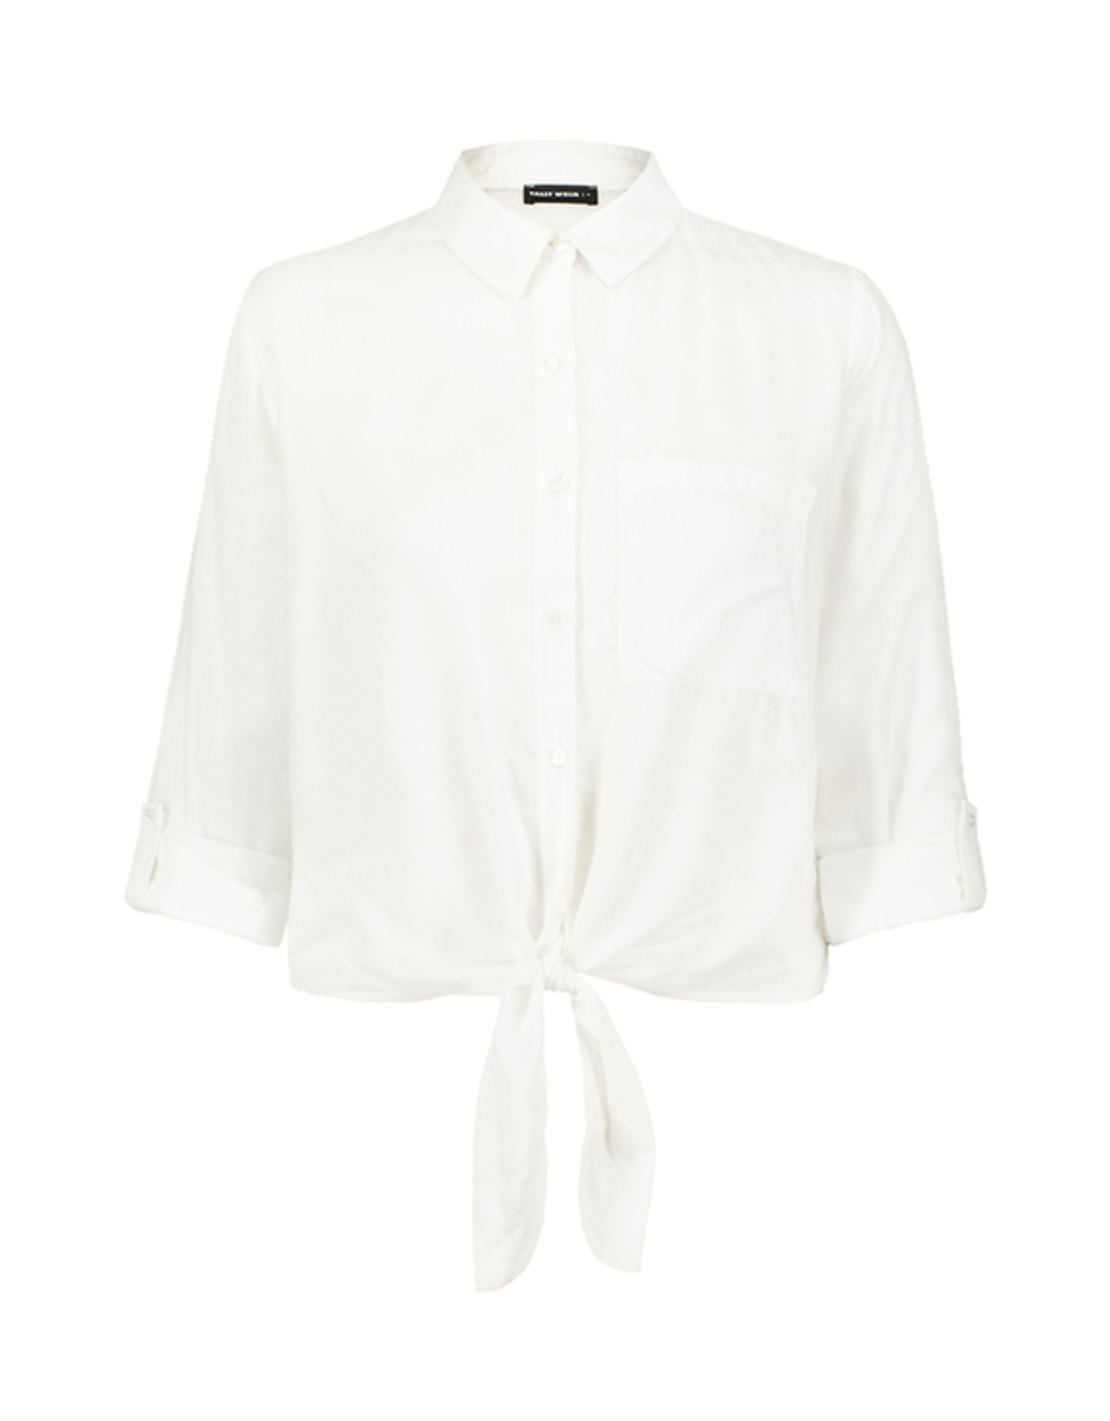 SWSMOFORUXY-AQ חולצה מכופתרת קשירה לבן